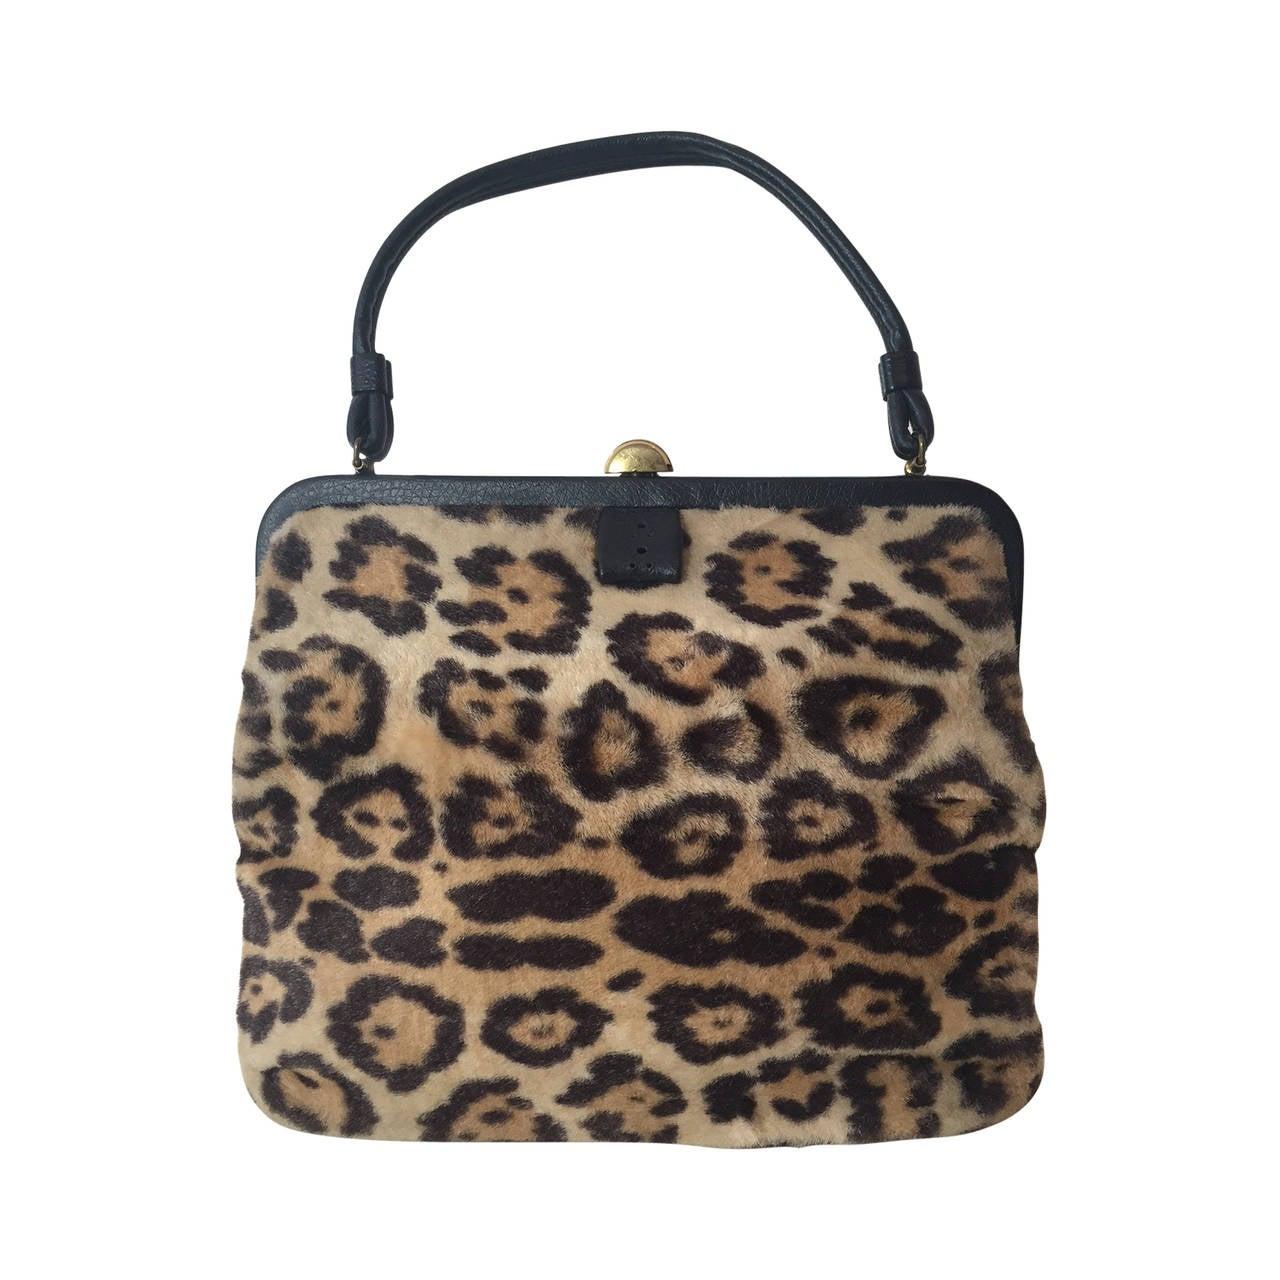 1950s Faux Leopard Fur Handbag 1